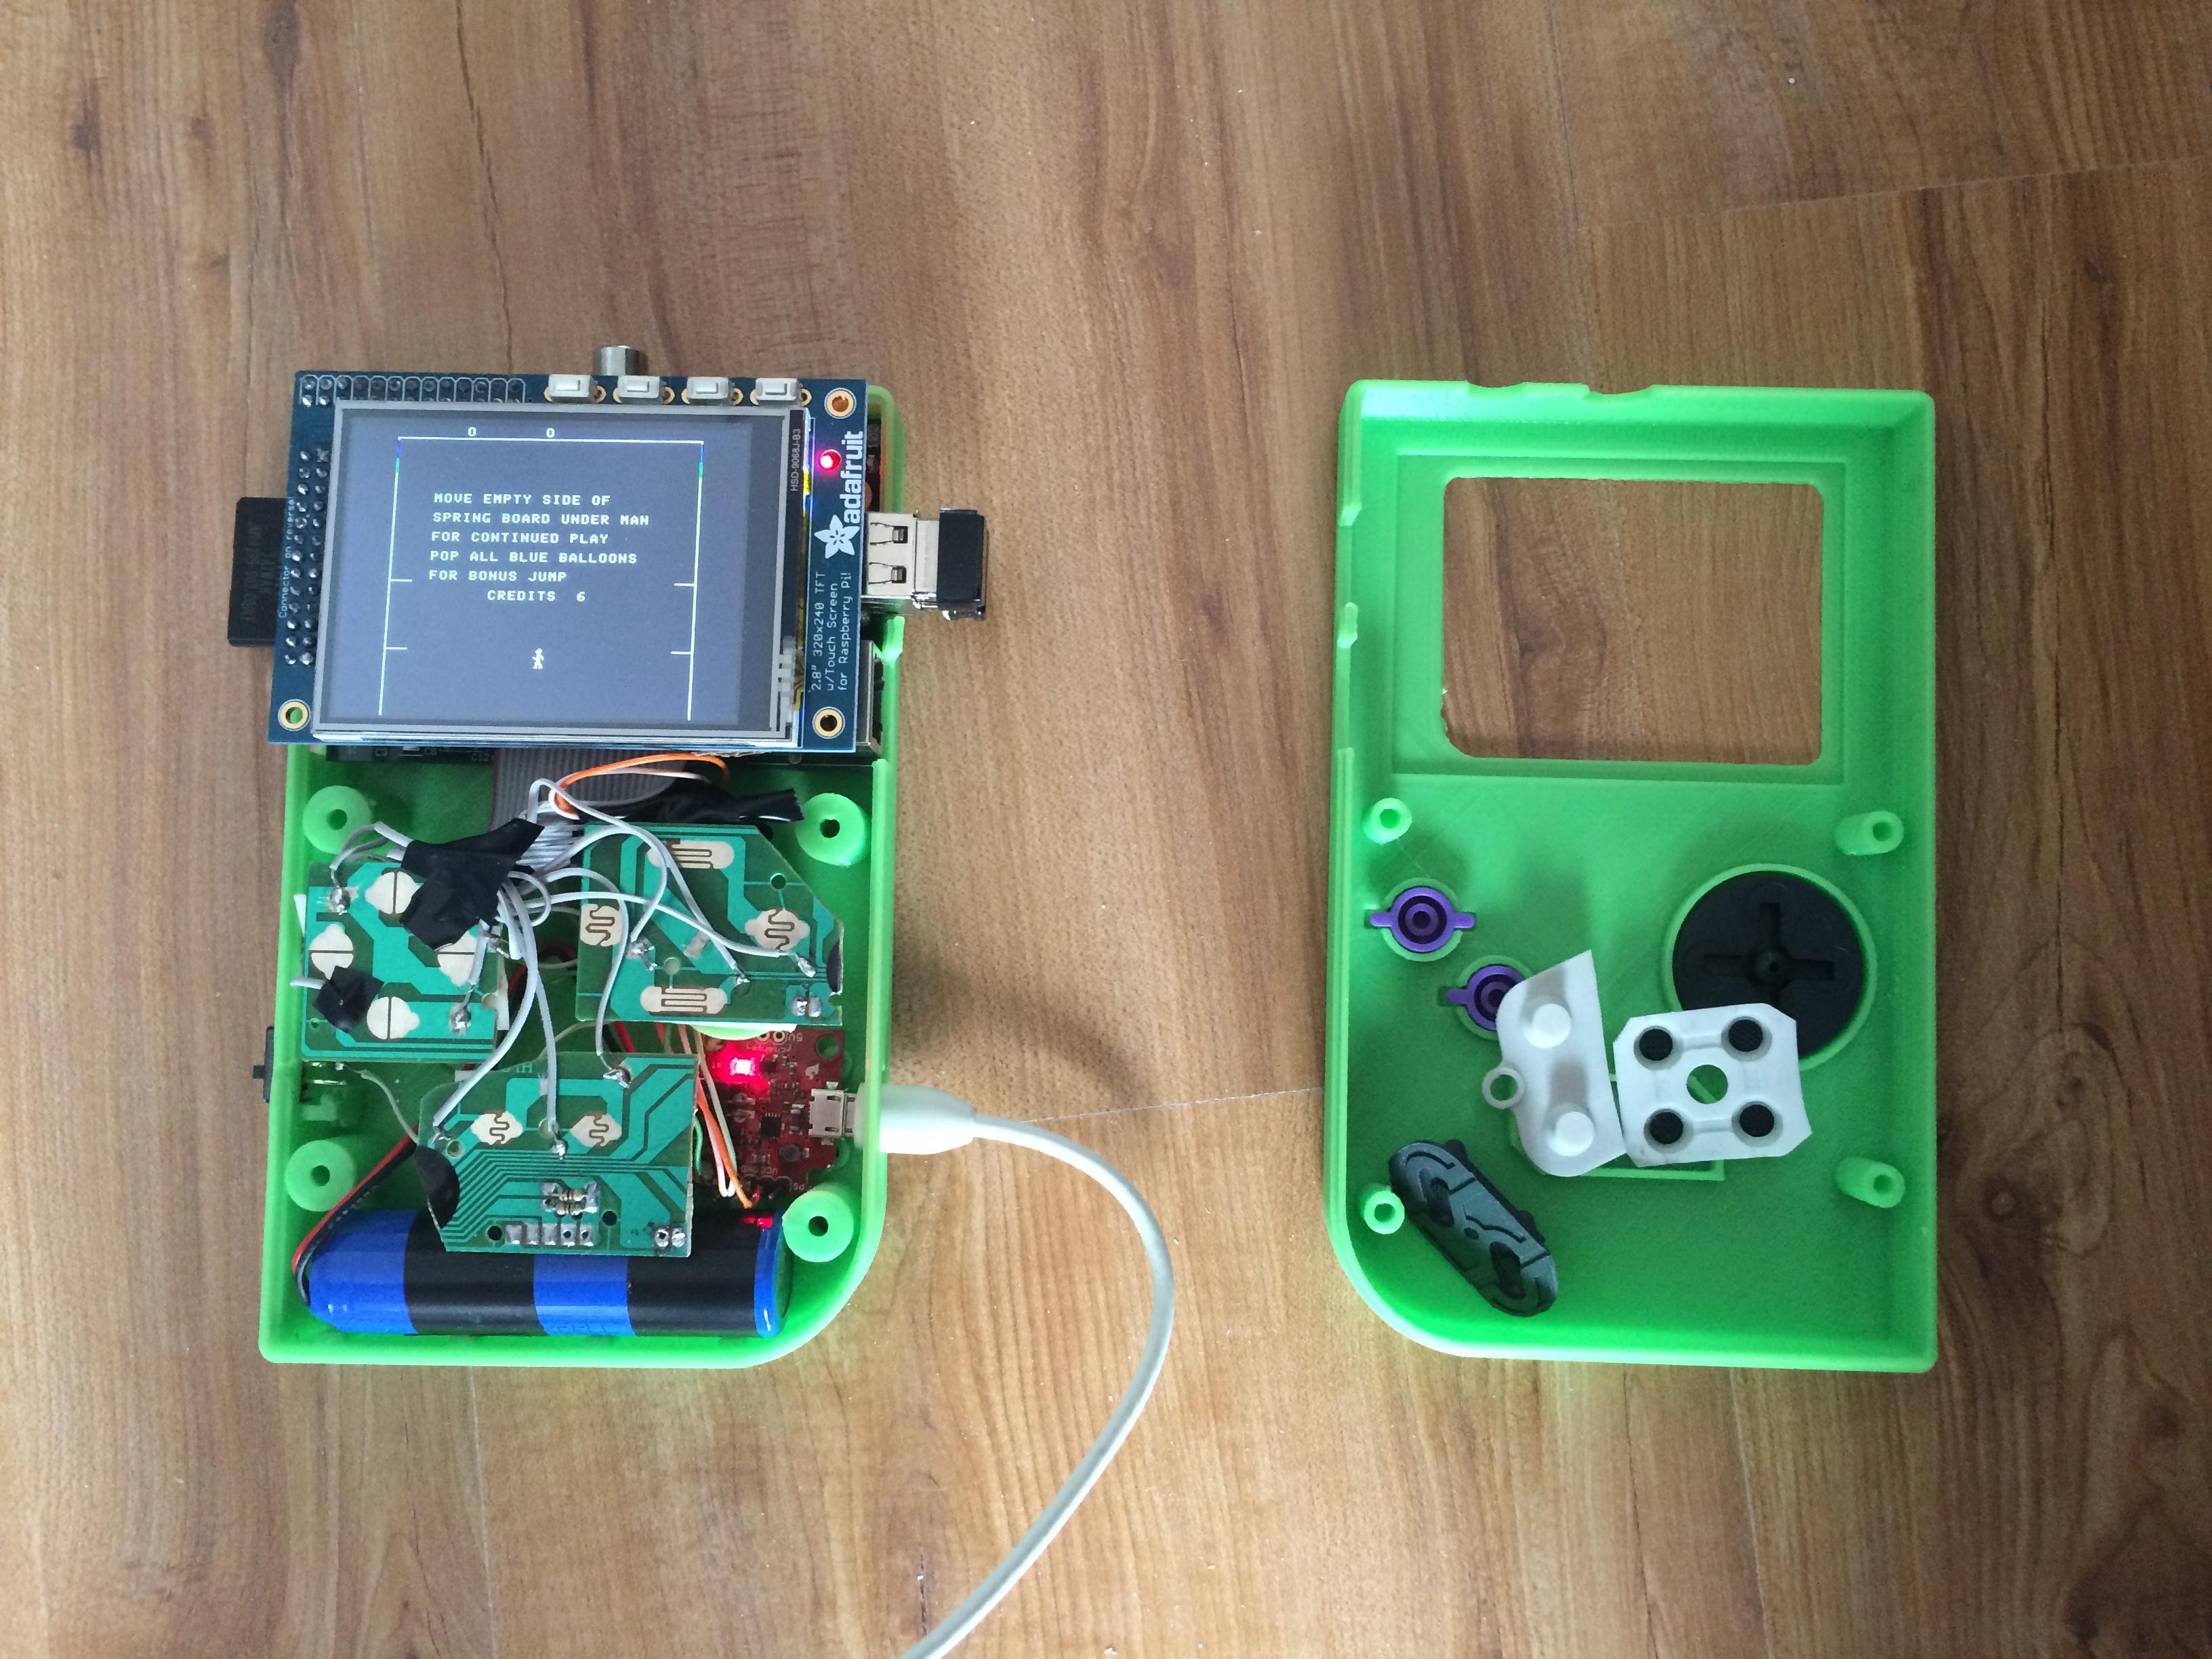 Building The Greenboy Err Piboy Pigrrls Friend A Cristians Blog Electronic Game Circuit Diagram Guts2